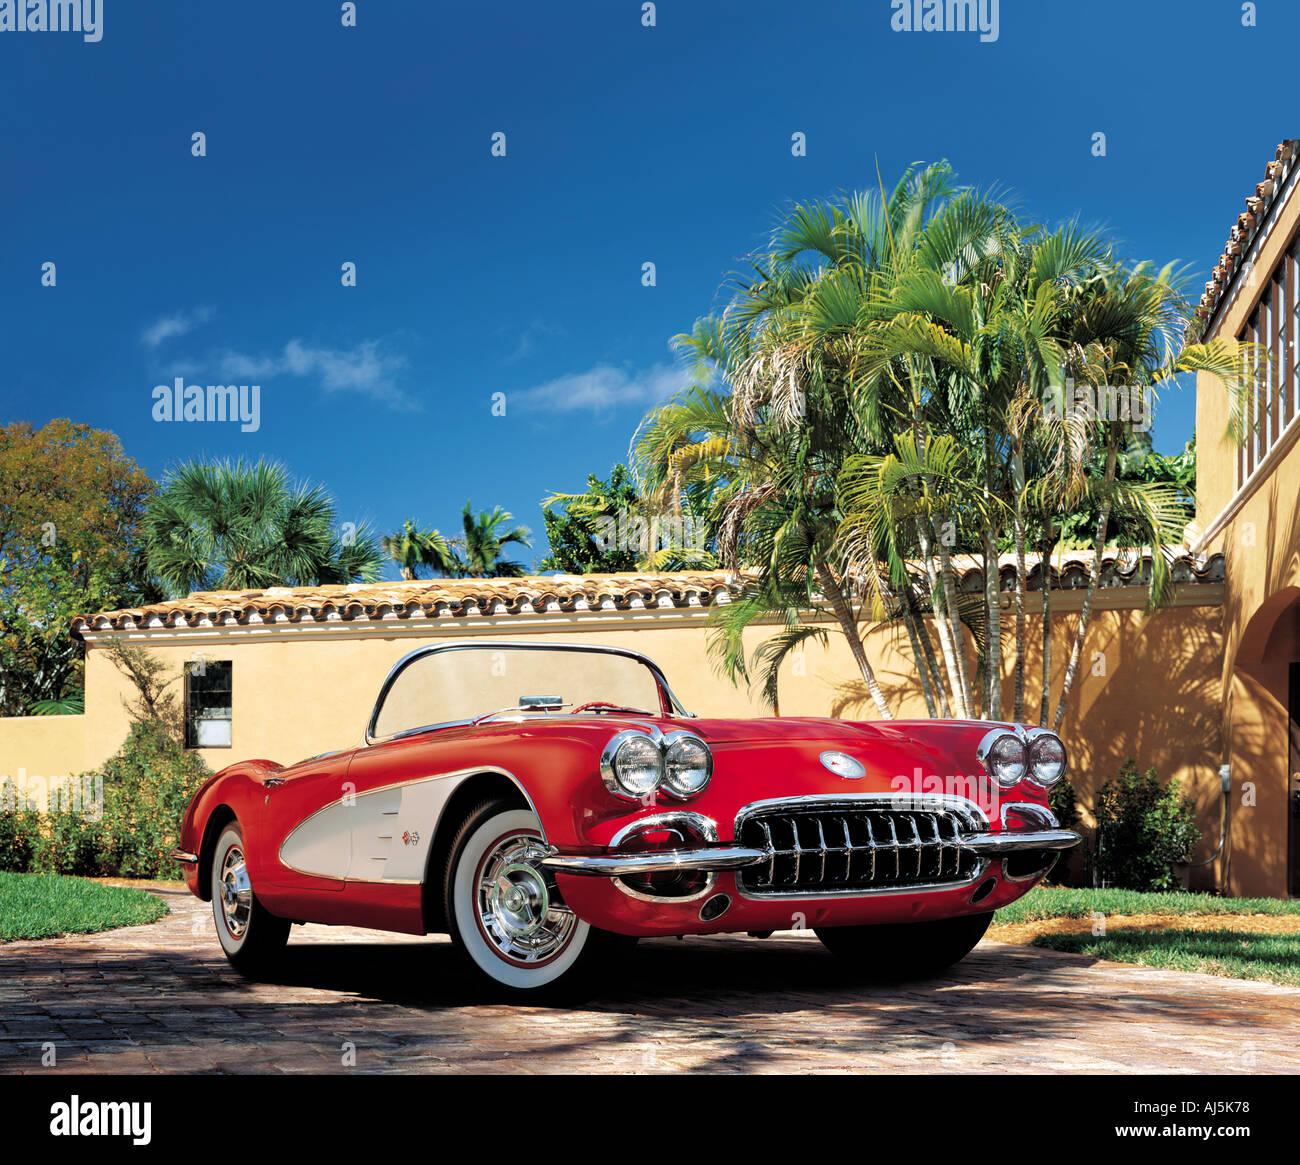 Red and White Teardrop 1960's Chevrolet Corvette - Stock Image